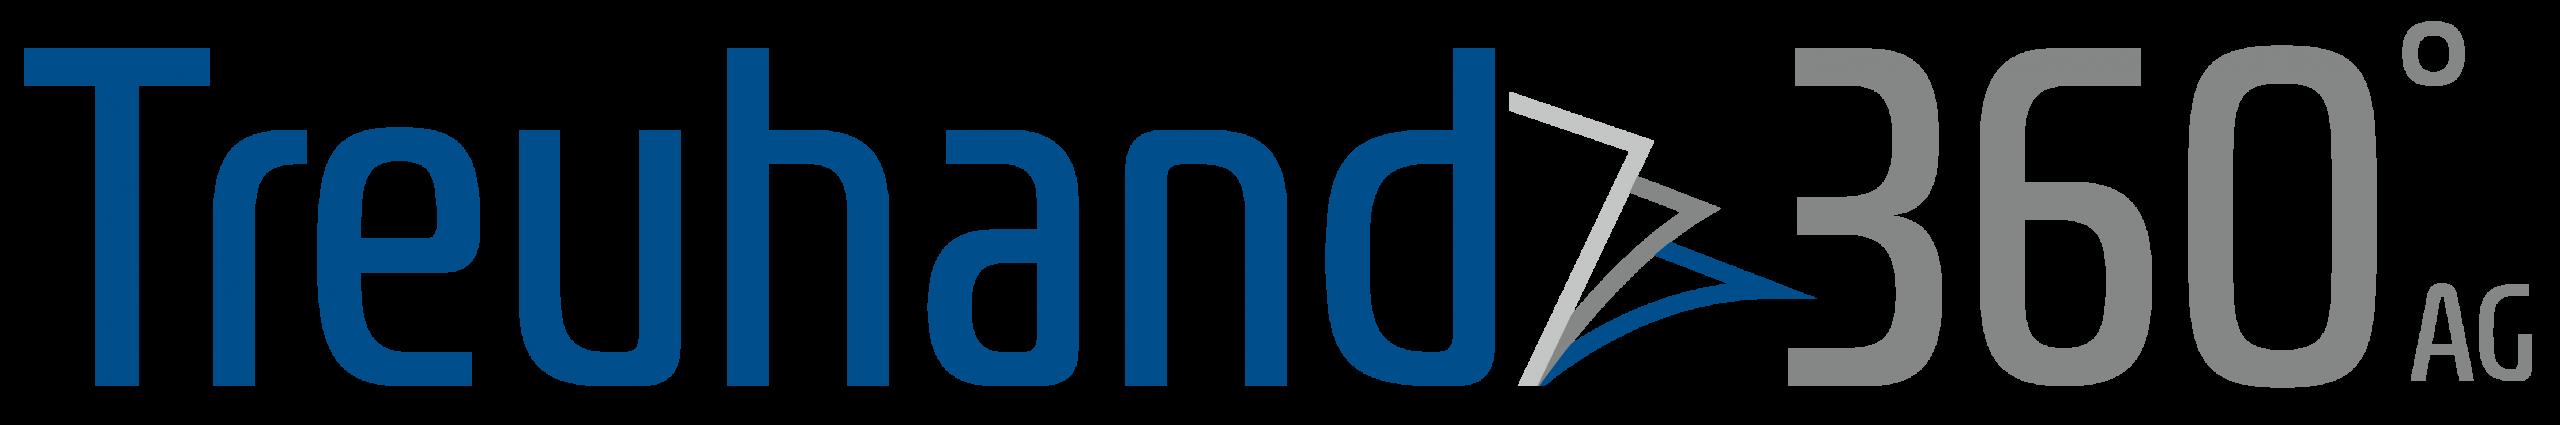 Treuhand 360 degrees AG logo